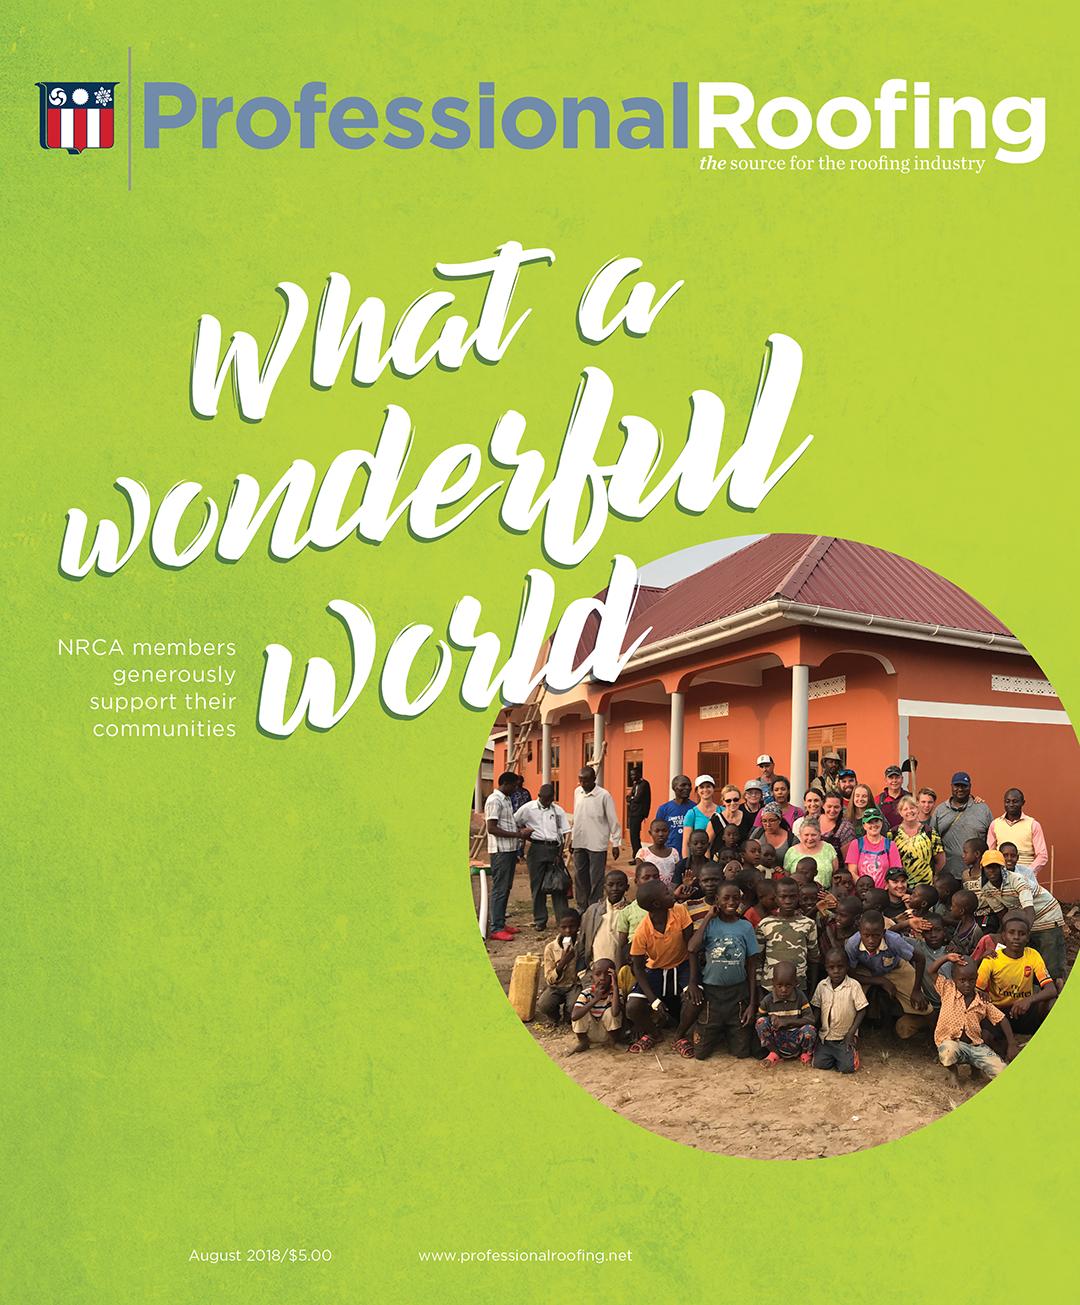 Professional Roofing Magazine 8/1/2018